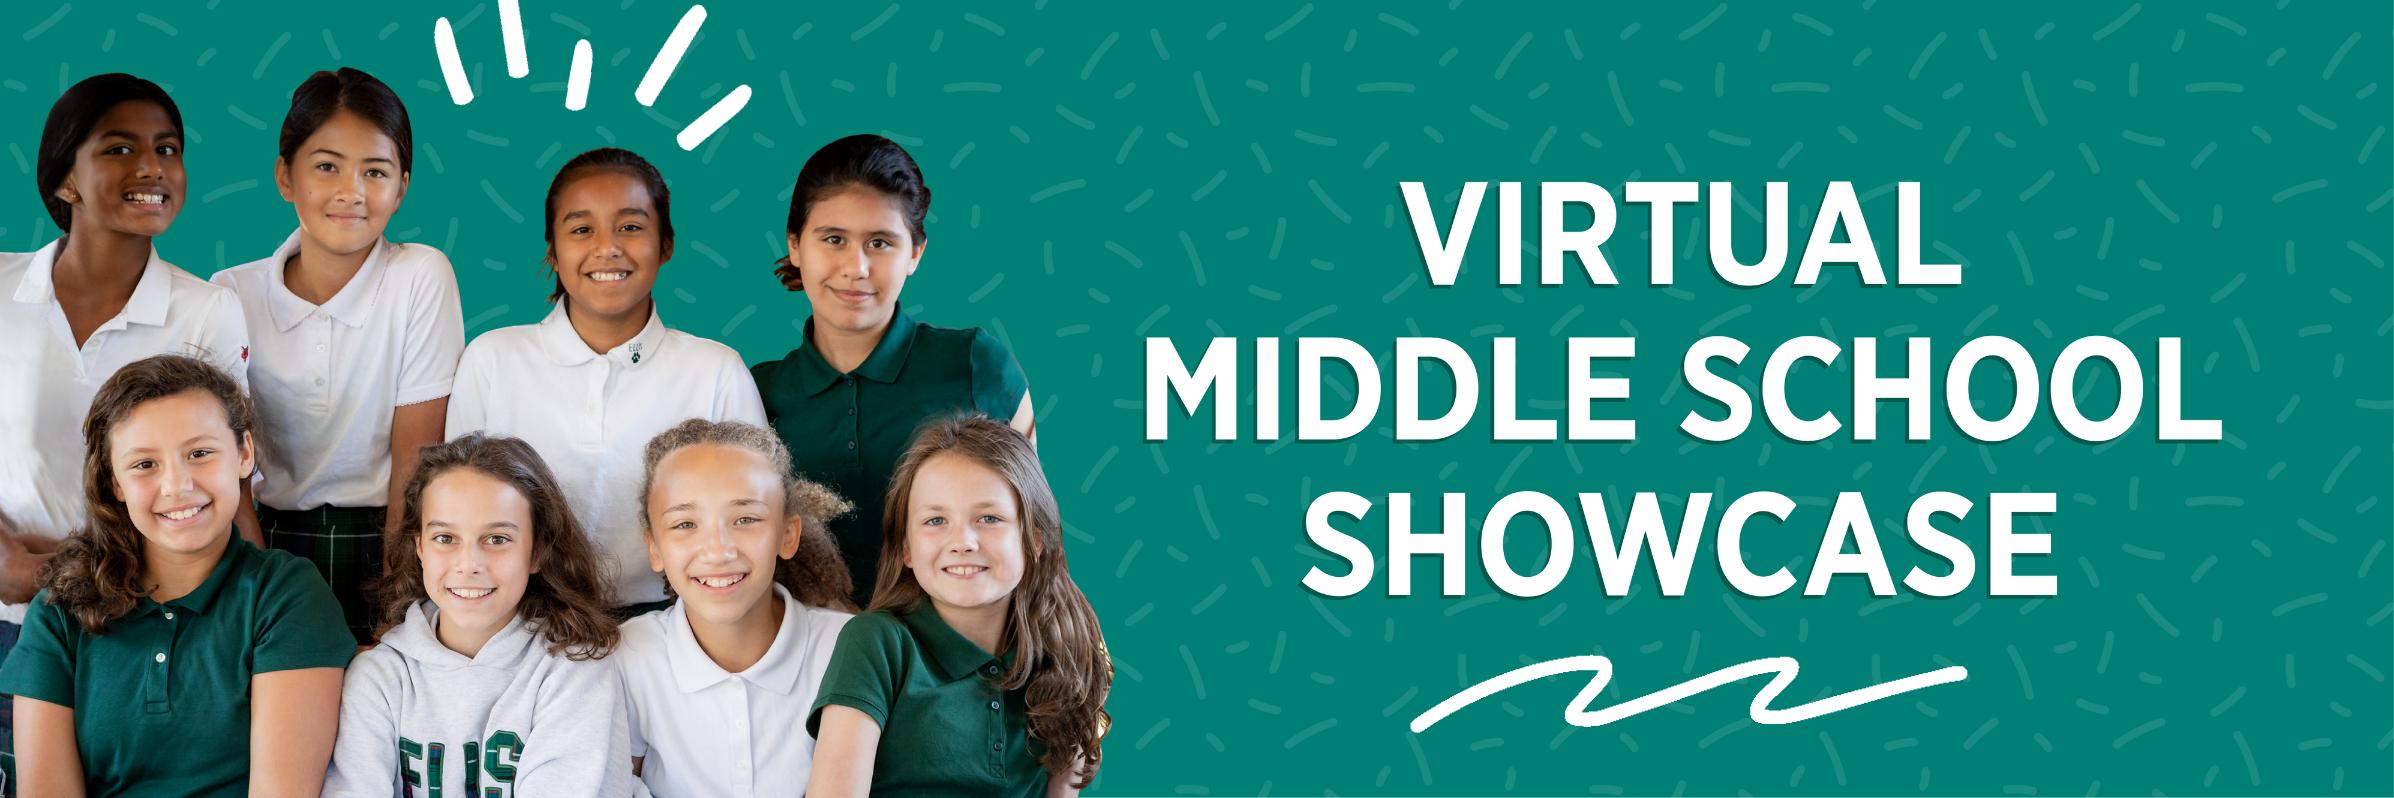 Virtual Middle School Showcase